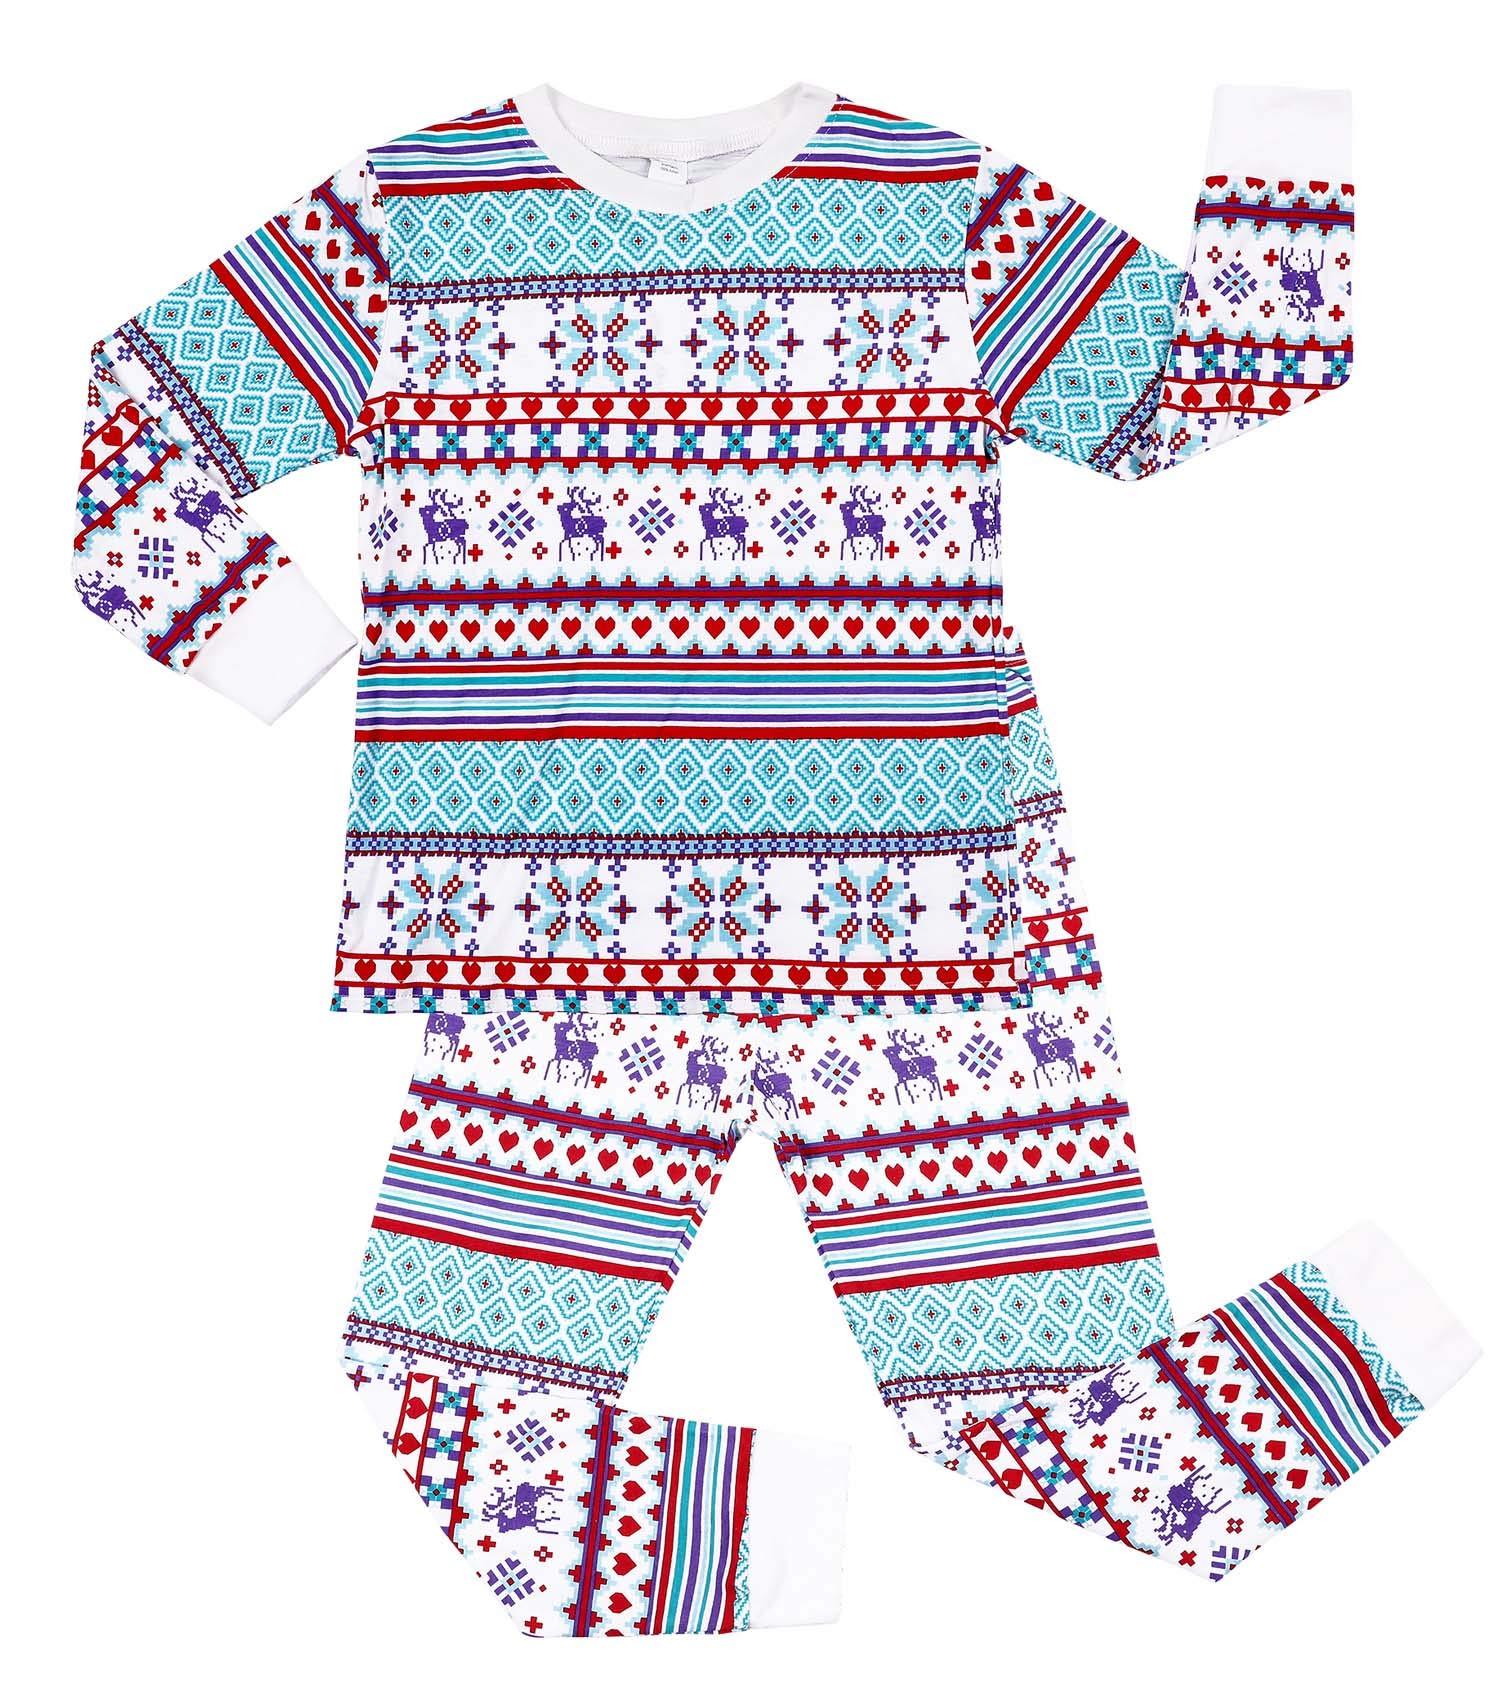 8f3a001406 V FOR CITY Children Christmas Pajamas Sets 3T Toddler Boy Girl Sleepwear  Reindeer Pajama Cotton PJS